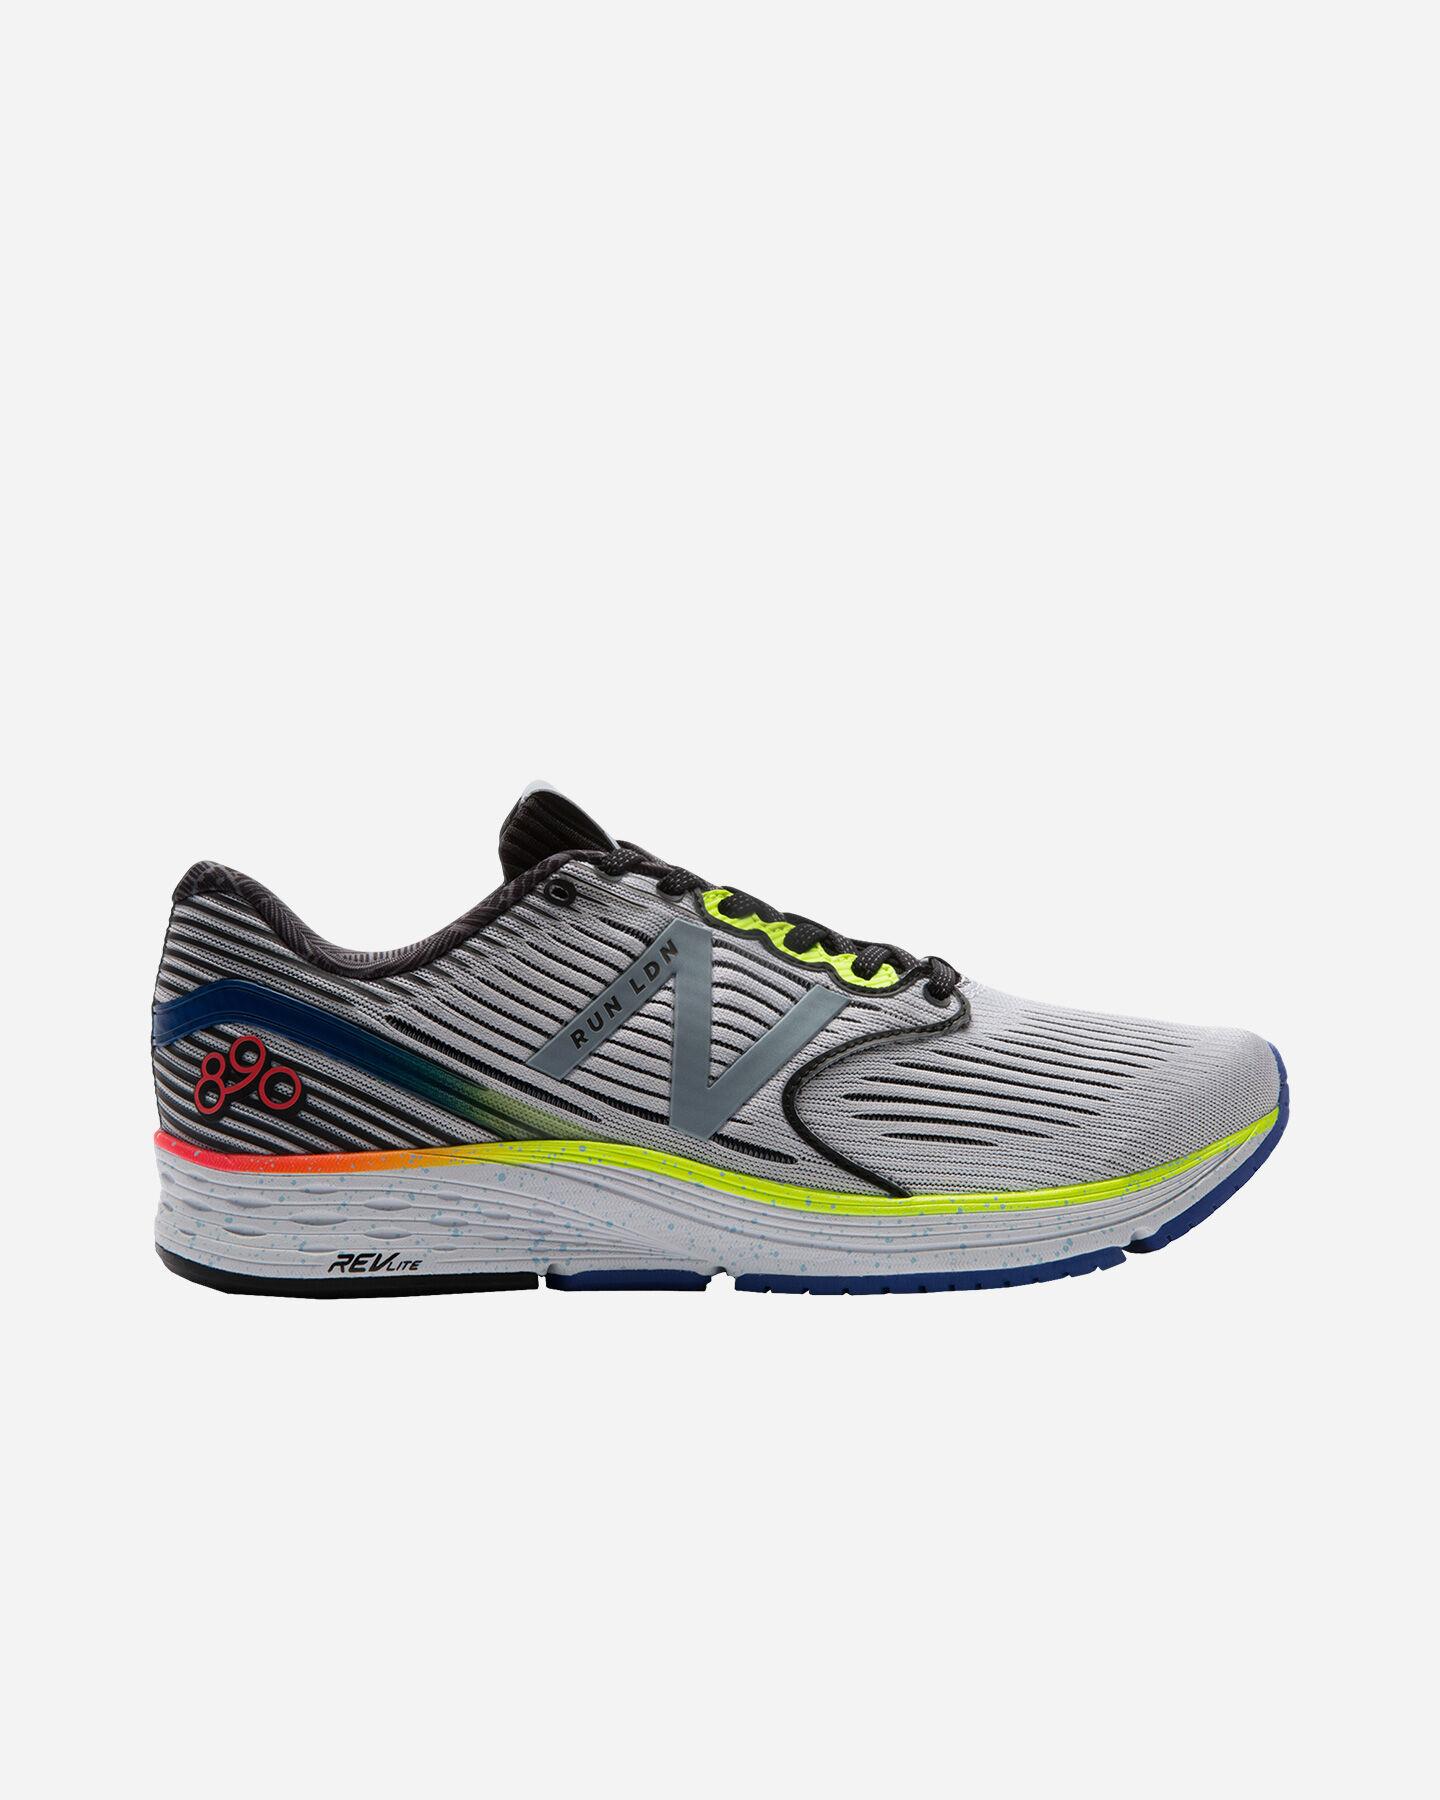 Scarpe 890v6 M890ln6 M Balance Sport Running Su Cisalfa London New OgvnX